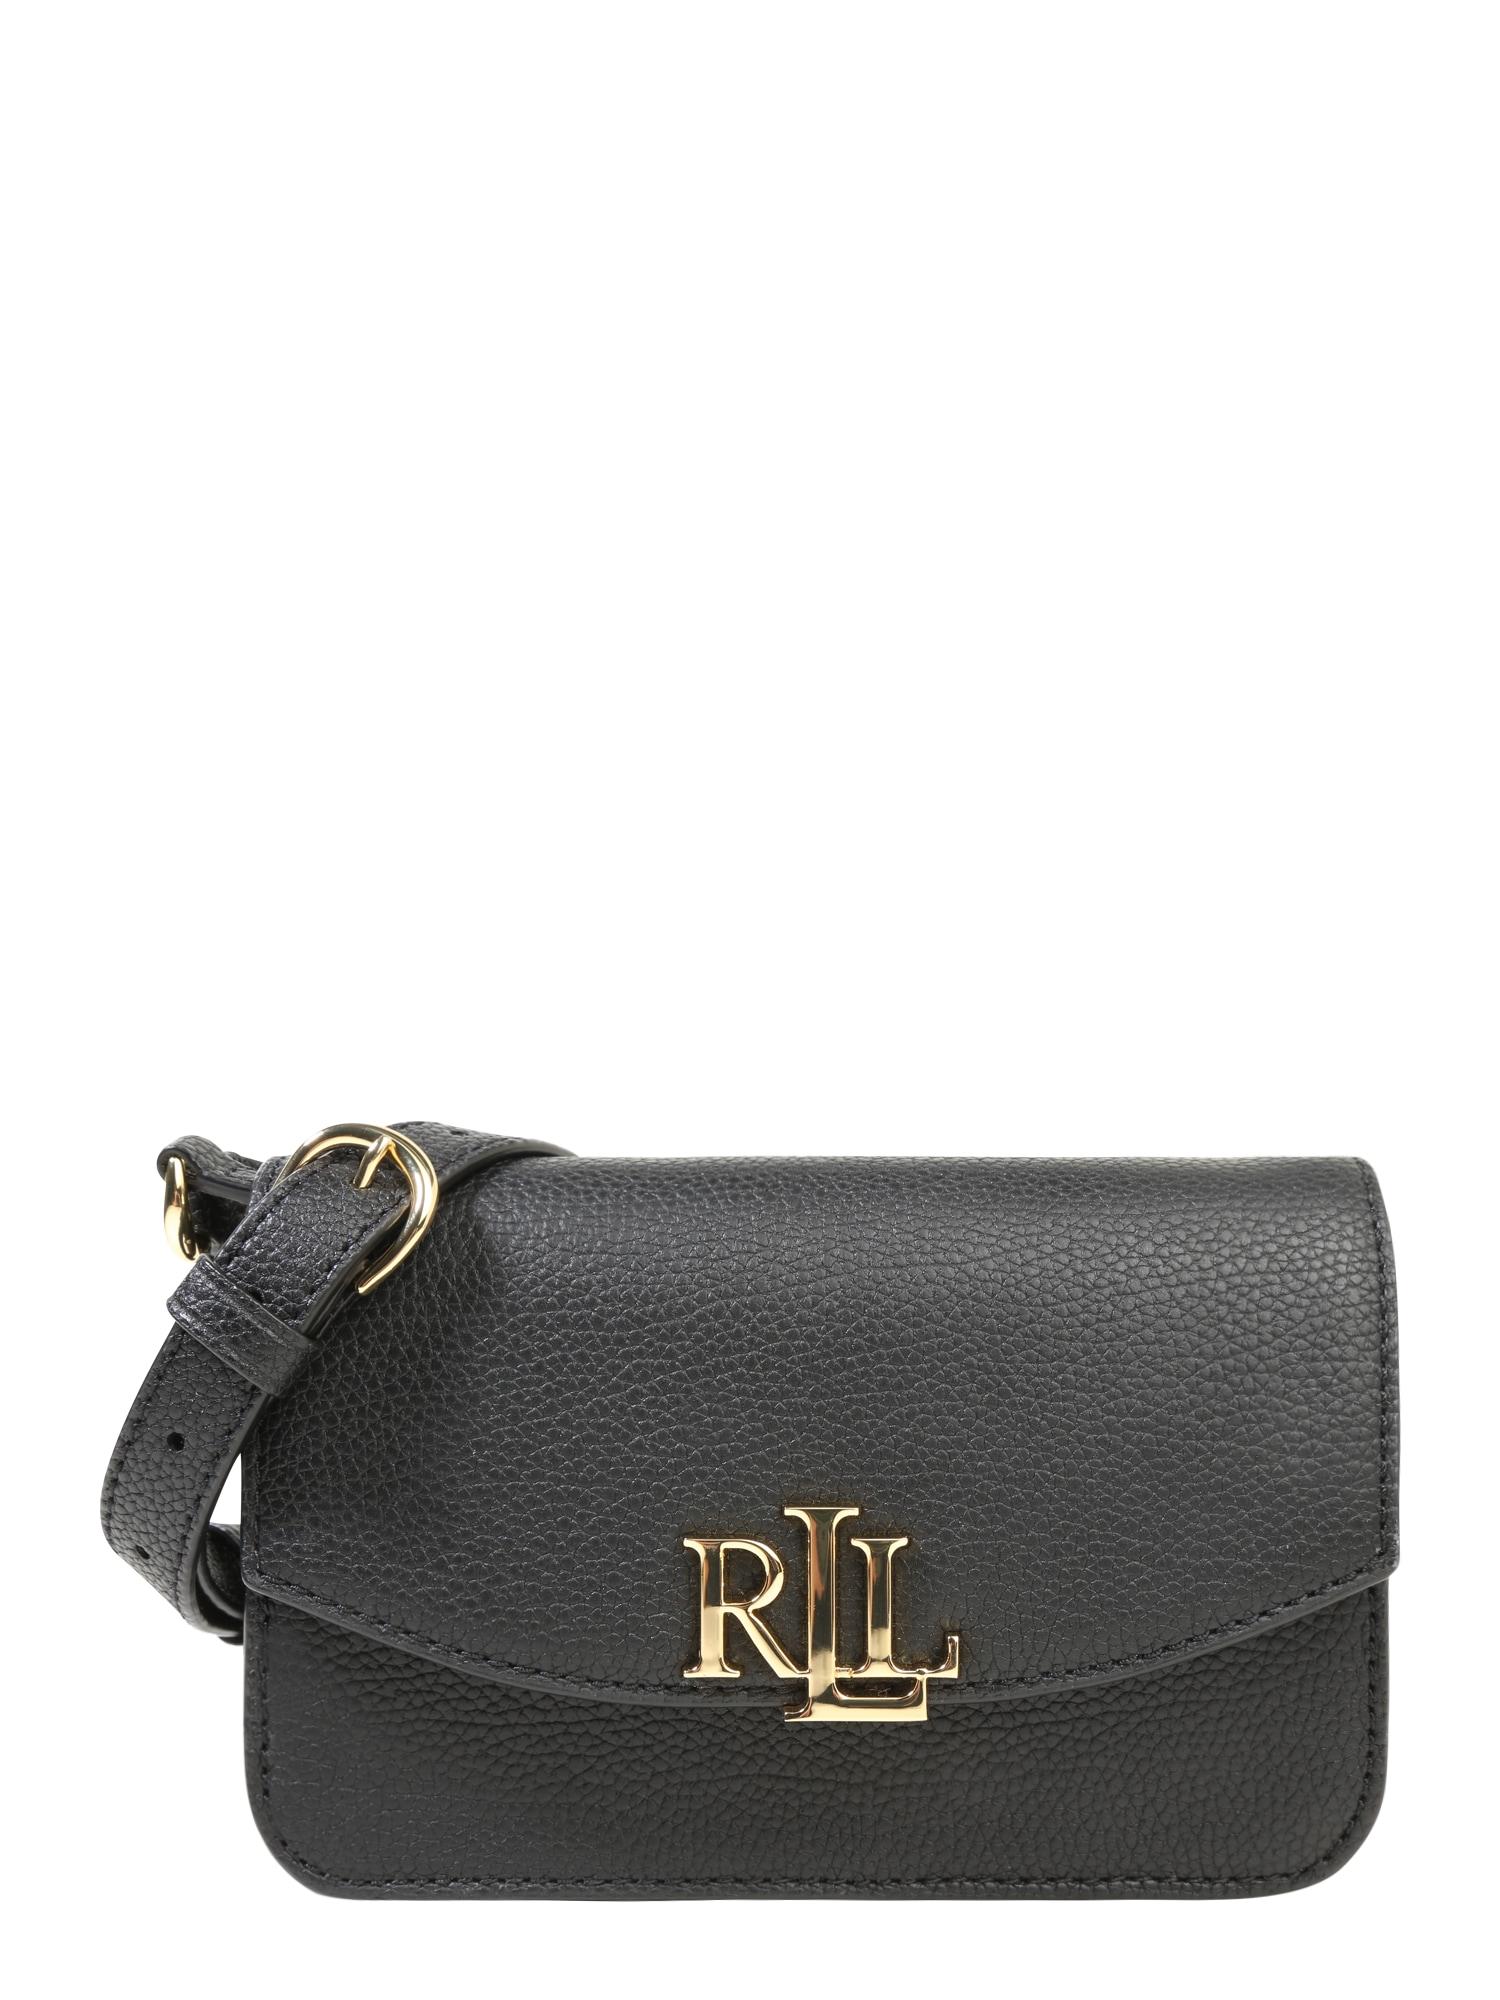 Taška přes rameno černá Lauren Ralph Lauren